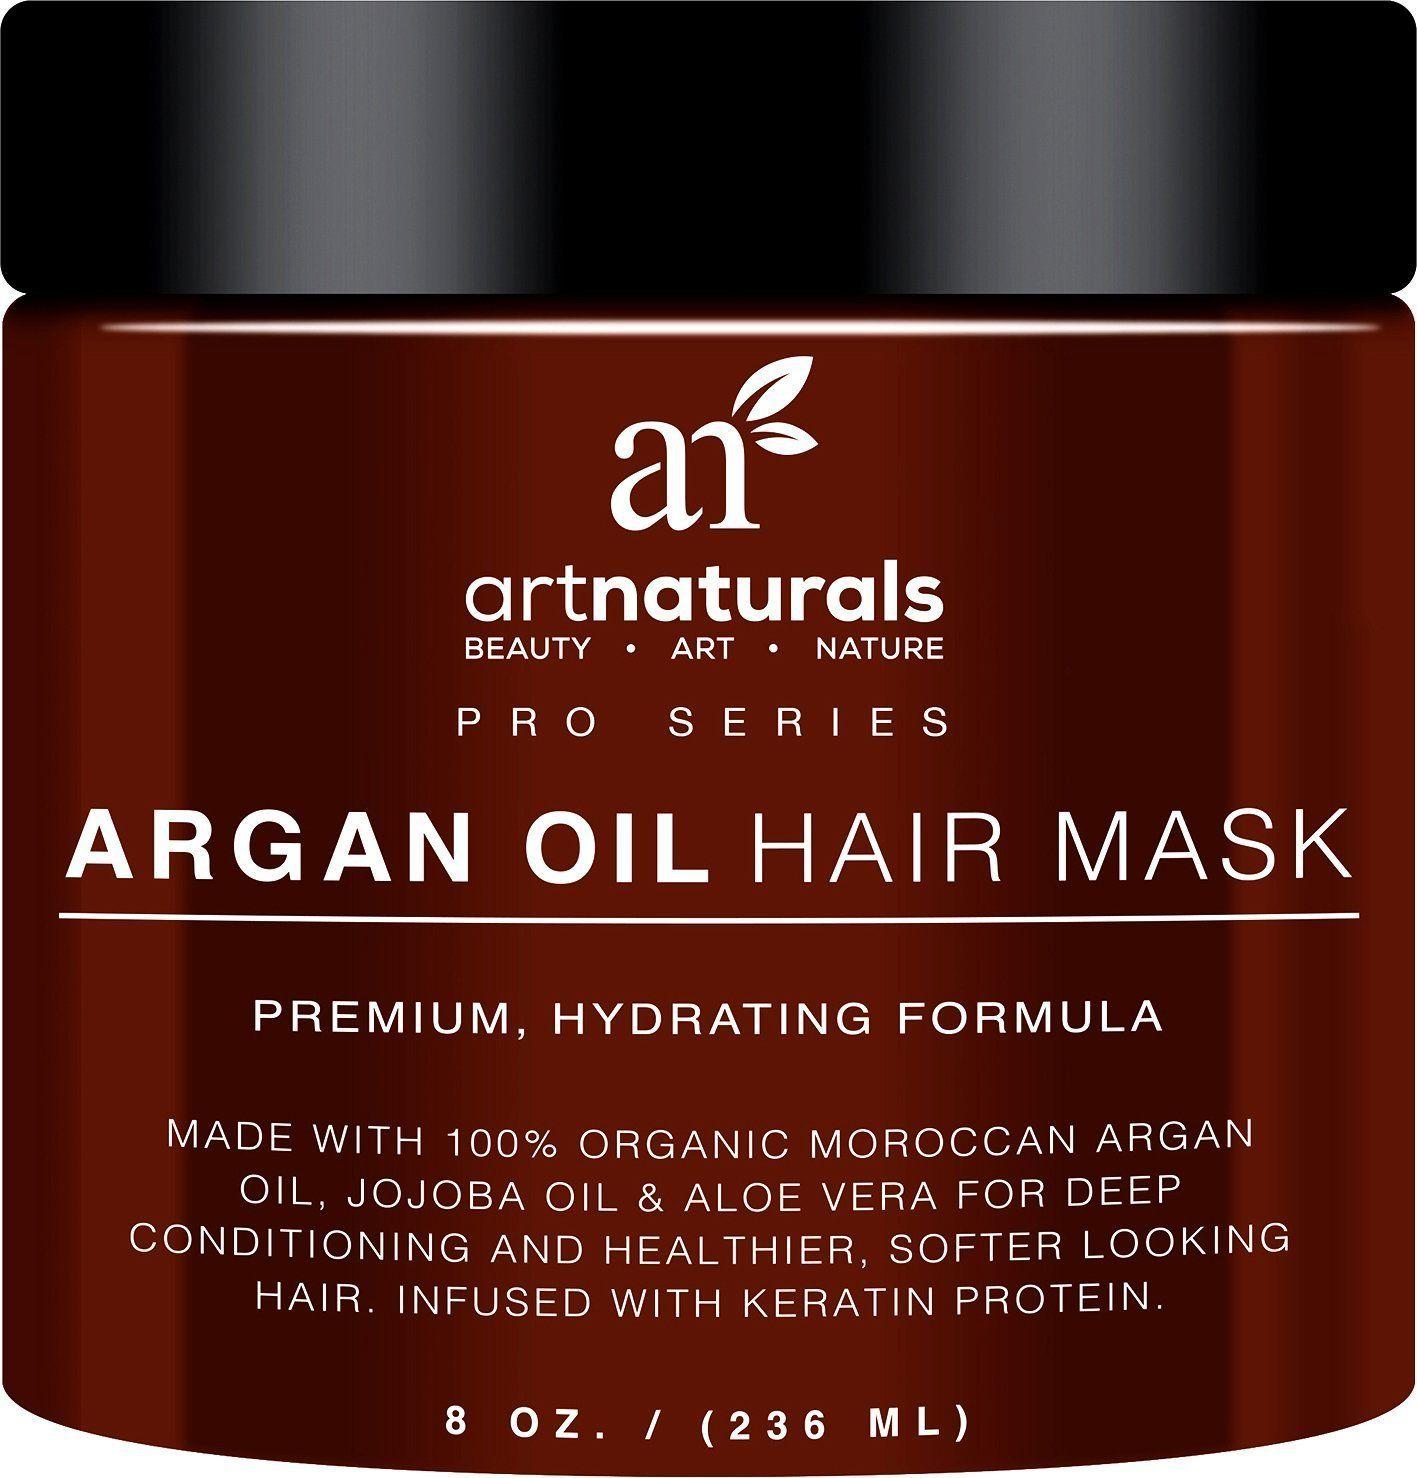 Artnaturals Argan Oil Hair Mask Deep Conditioner 100 Organic Jojoba Aloe Vera And Keratin Rep Argan Oil Hair Mask Argan Oil Hair Natural Hair Conditioner